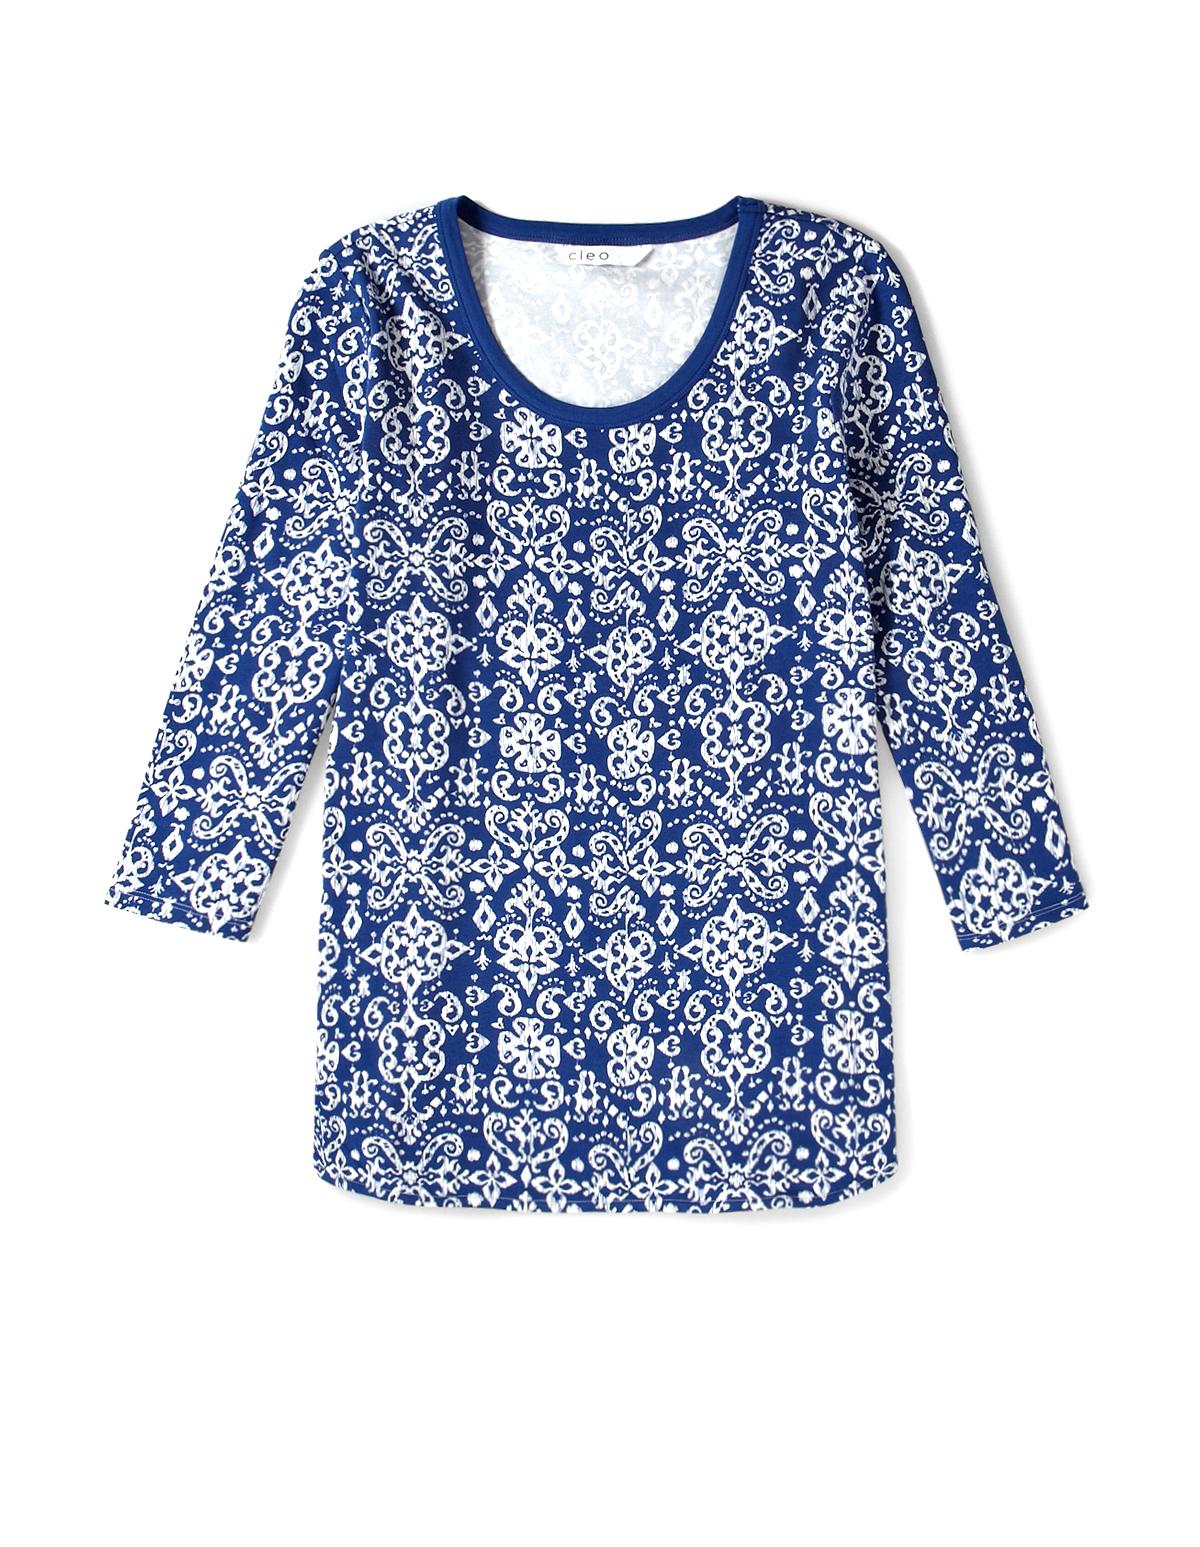 5e35699e325dab Printed 3/4 Sleeve Pajama Top, Blue/Ivory, hi-res